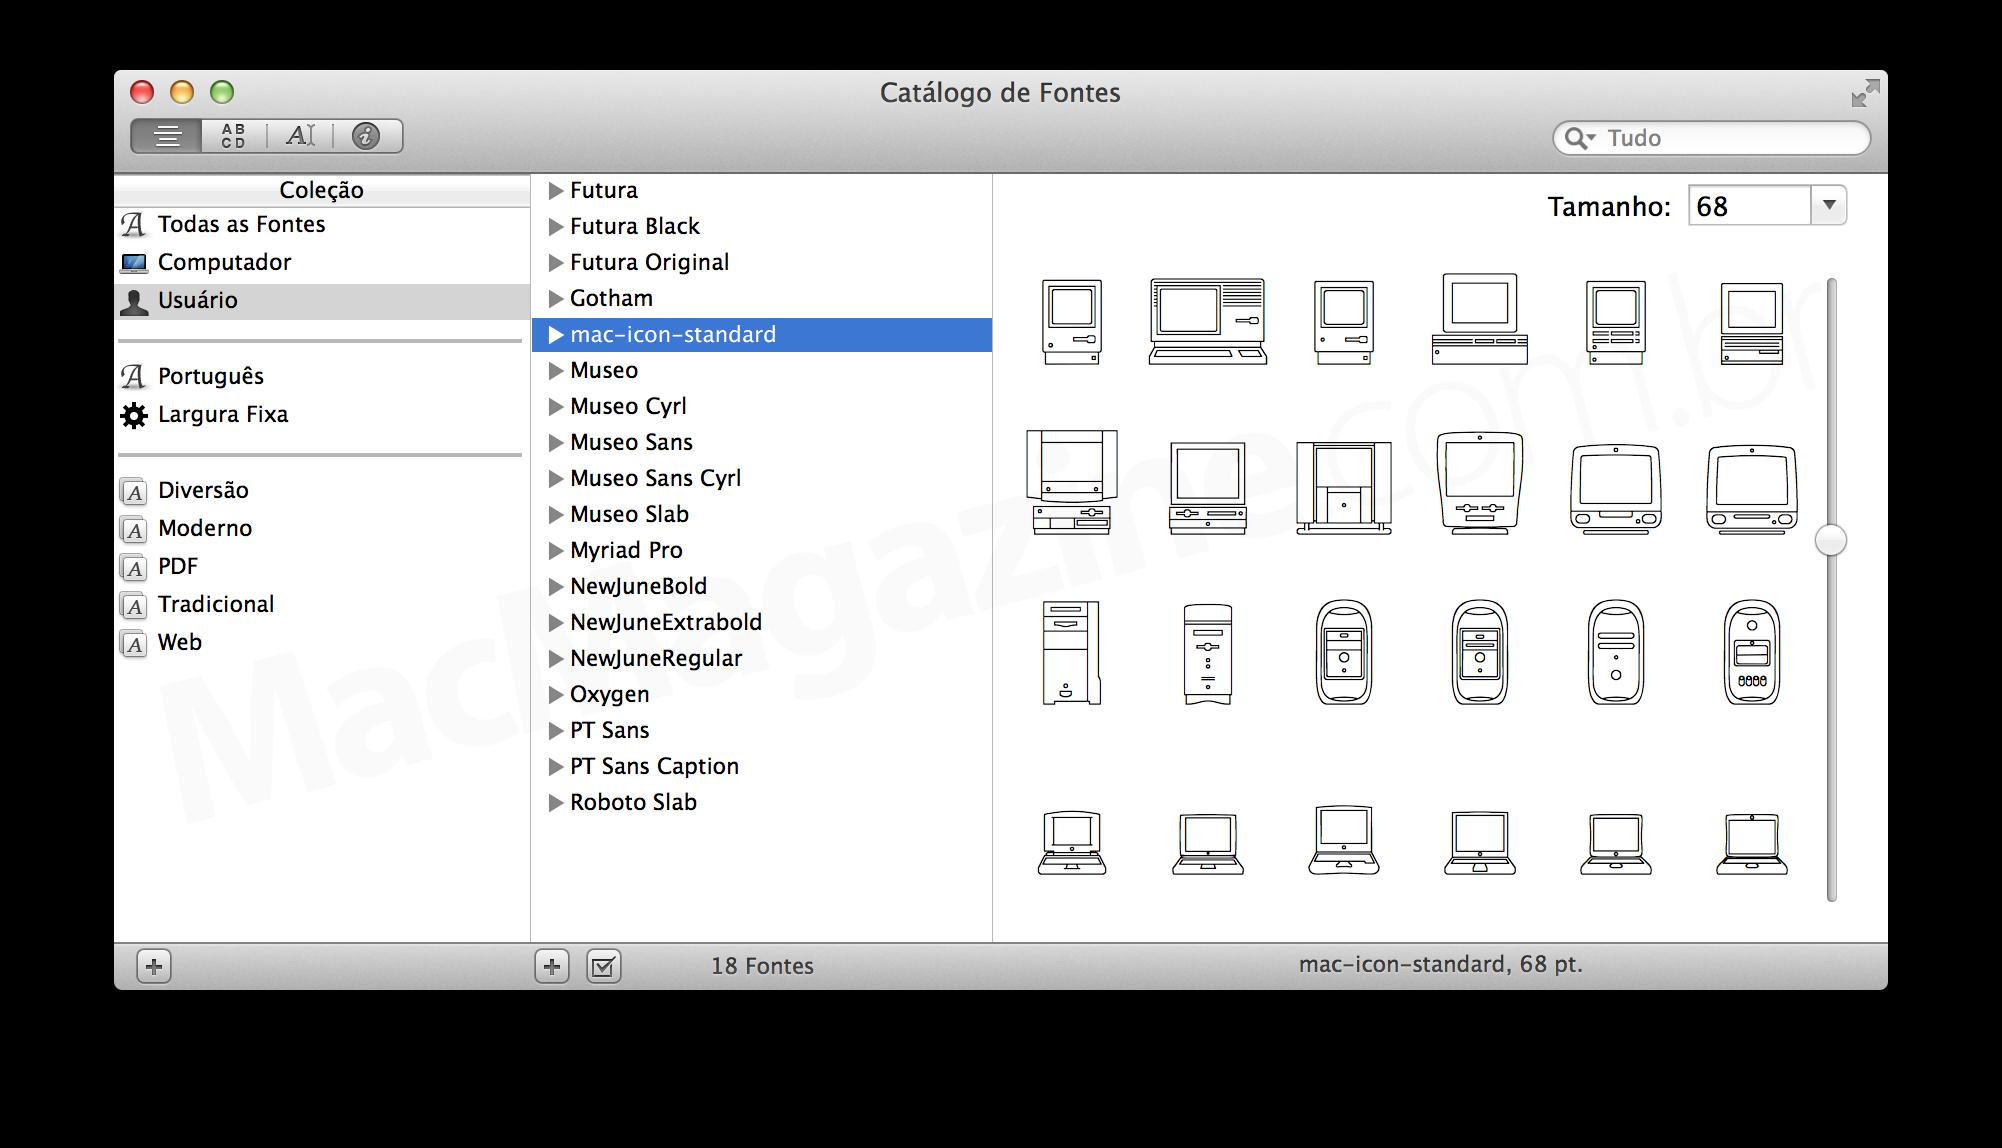 Catálogo de Fontes (mac-icon-standard)